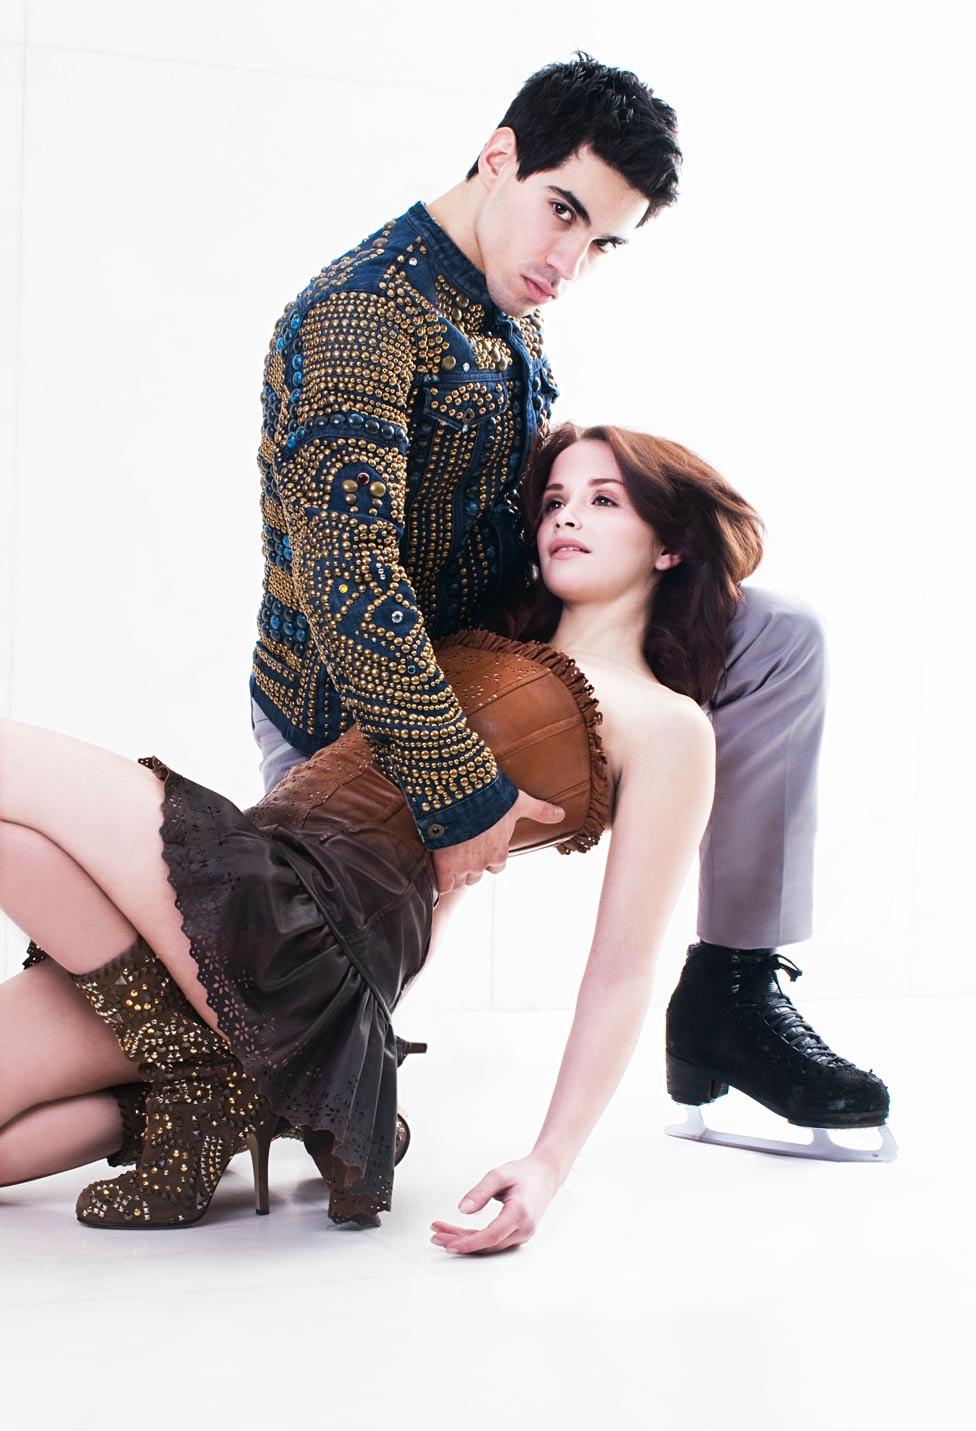 Анна Капеллини - Лука Ланоте / Anna CAPPELLINI - Luca LANOTTE ITA - Страница 3 4